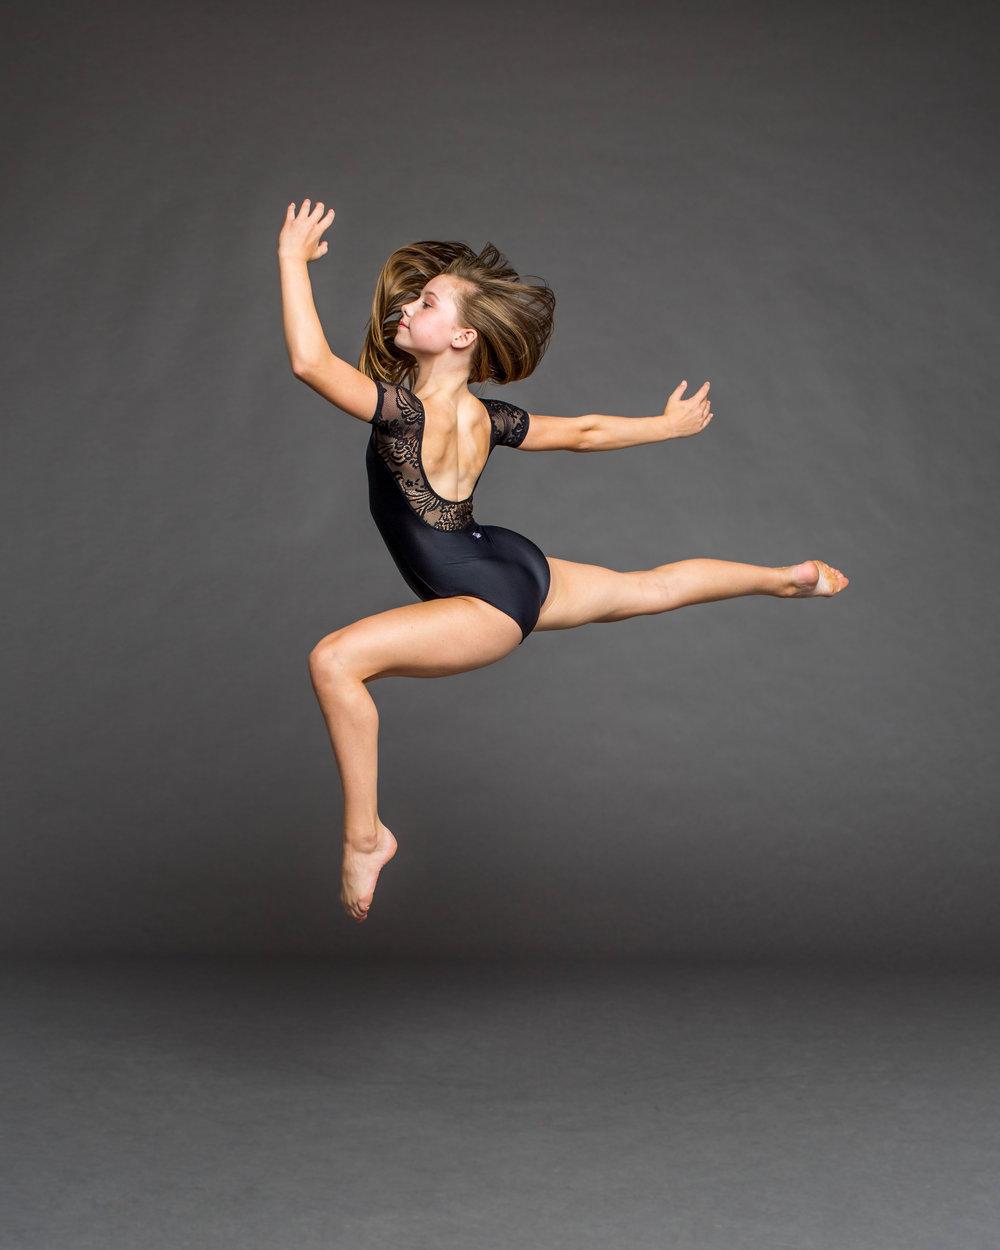 Alyx Kuhlman jump.jpg